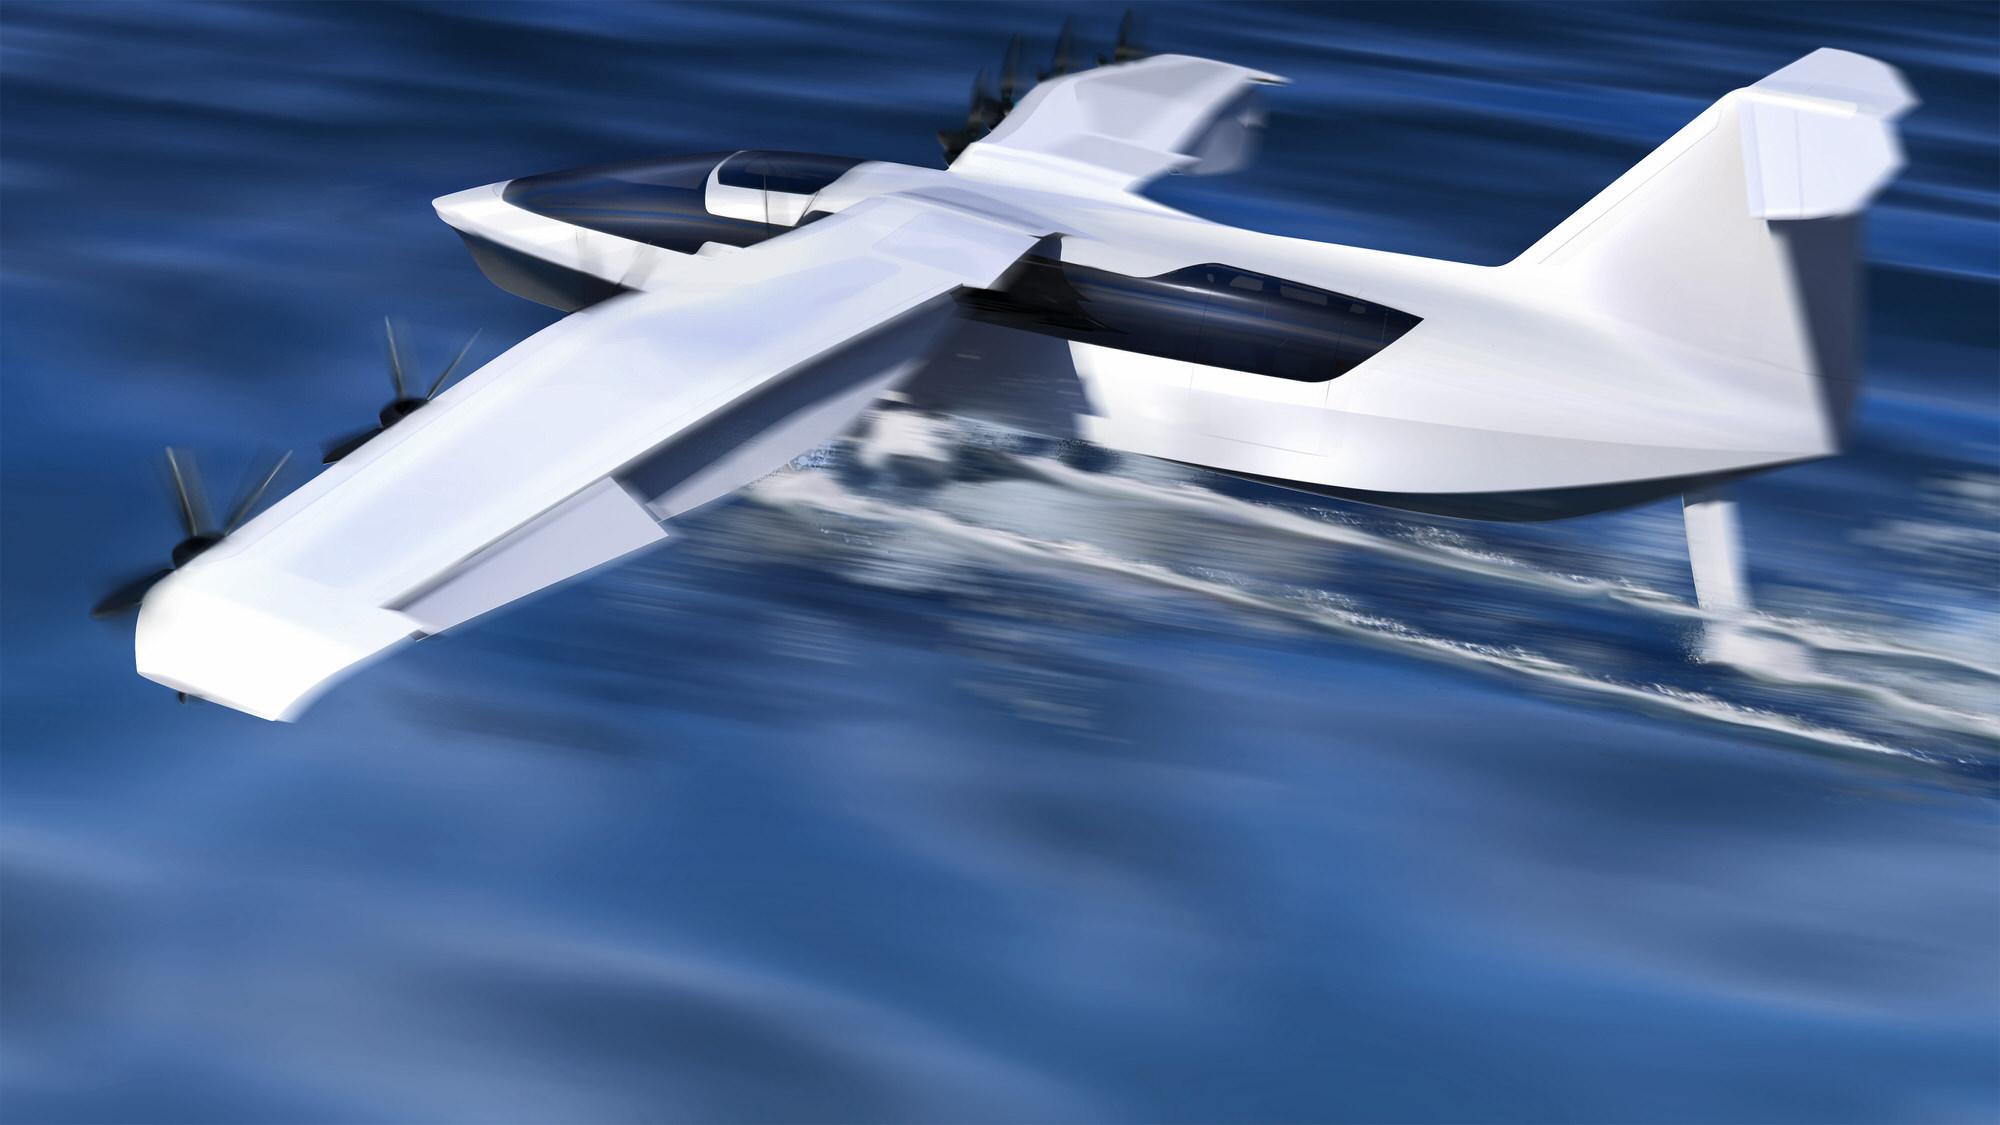 Regent Seaglider taking off